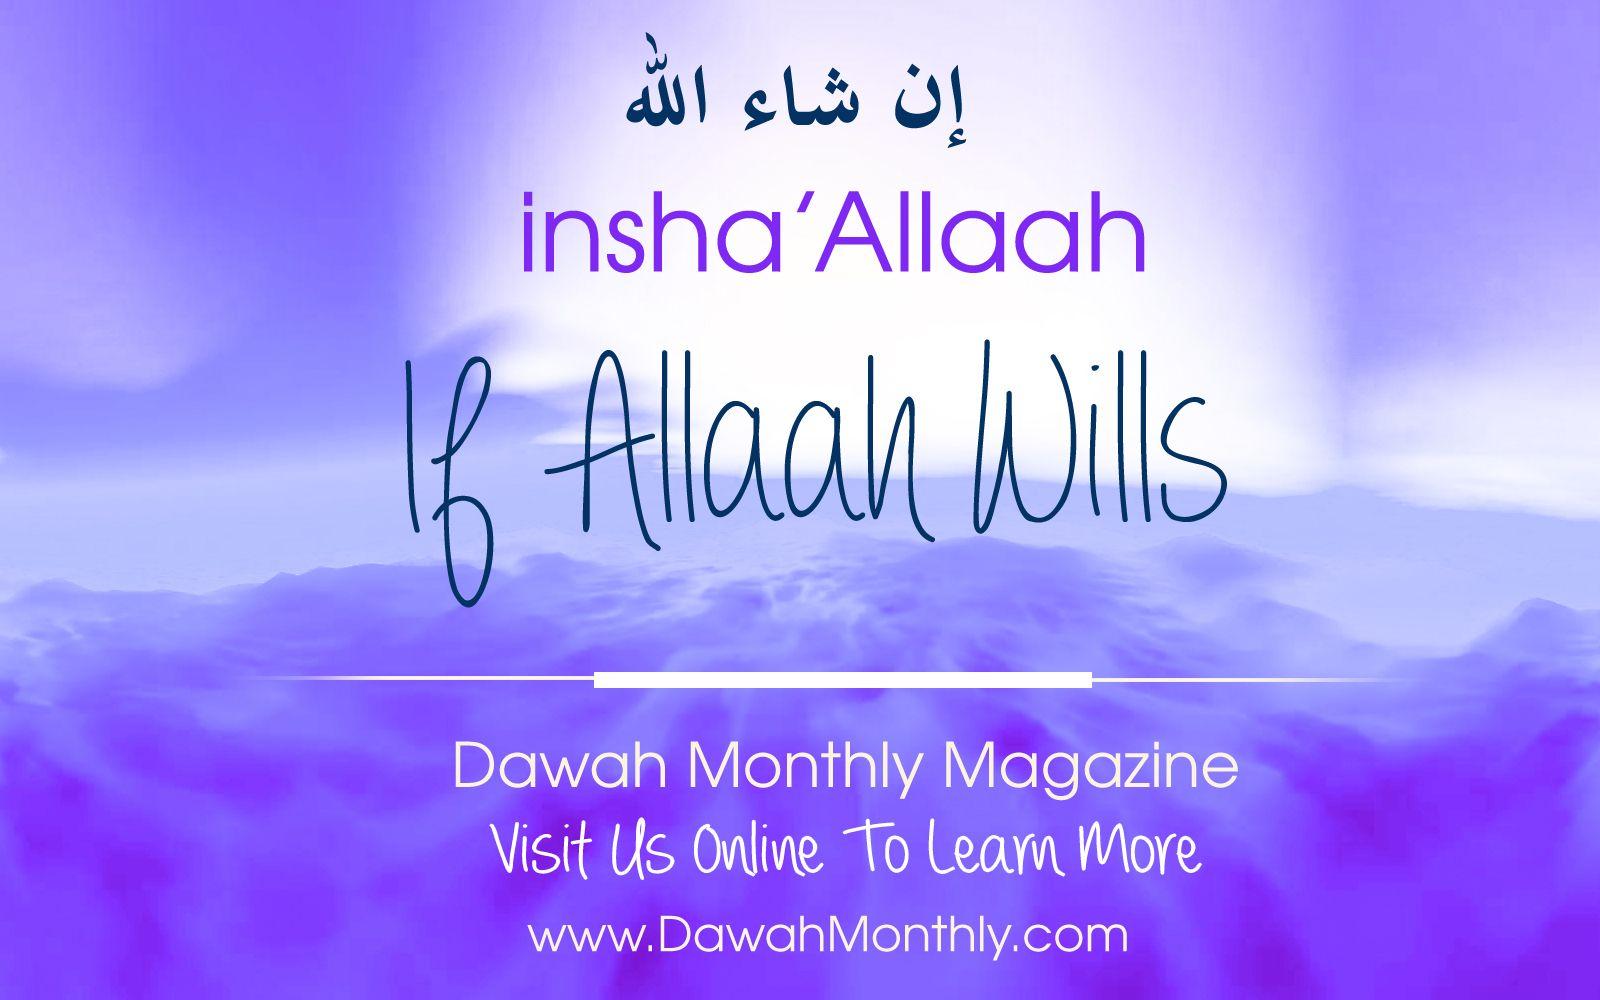 InSha'Allah - If Allah Wills | Words of wisdom. Words. Wisdom